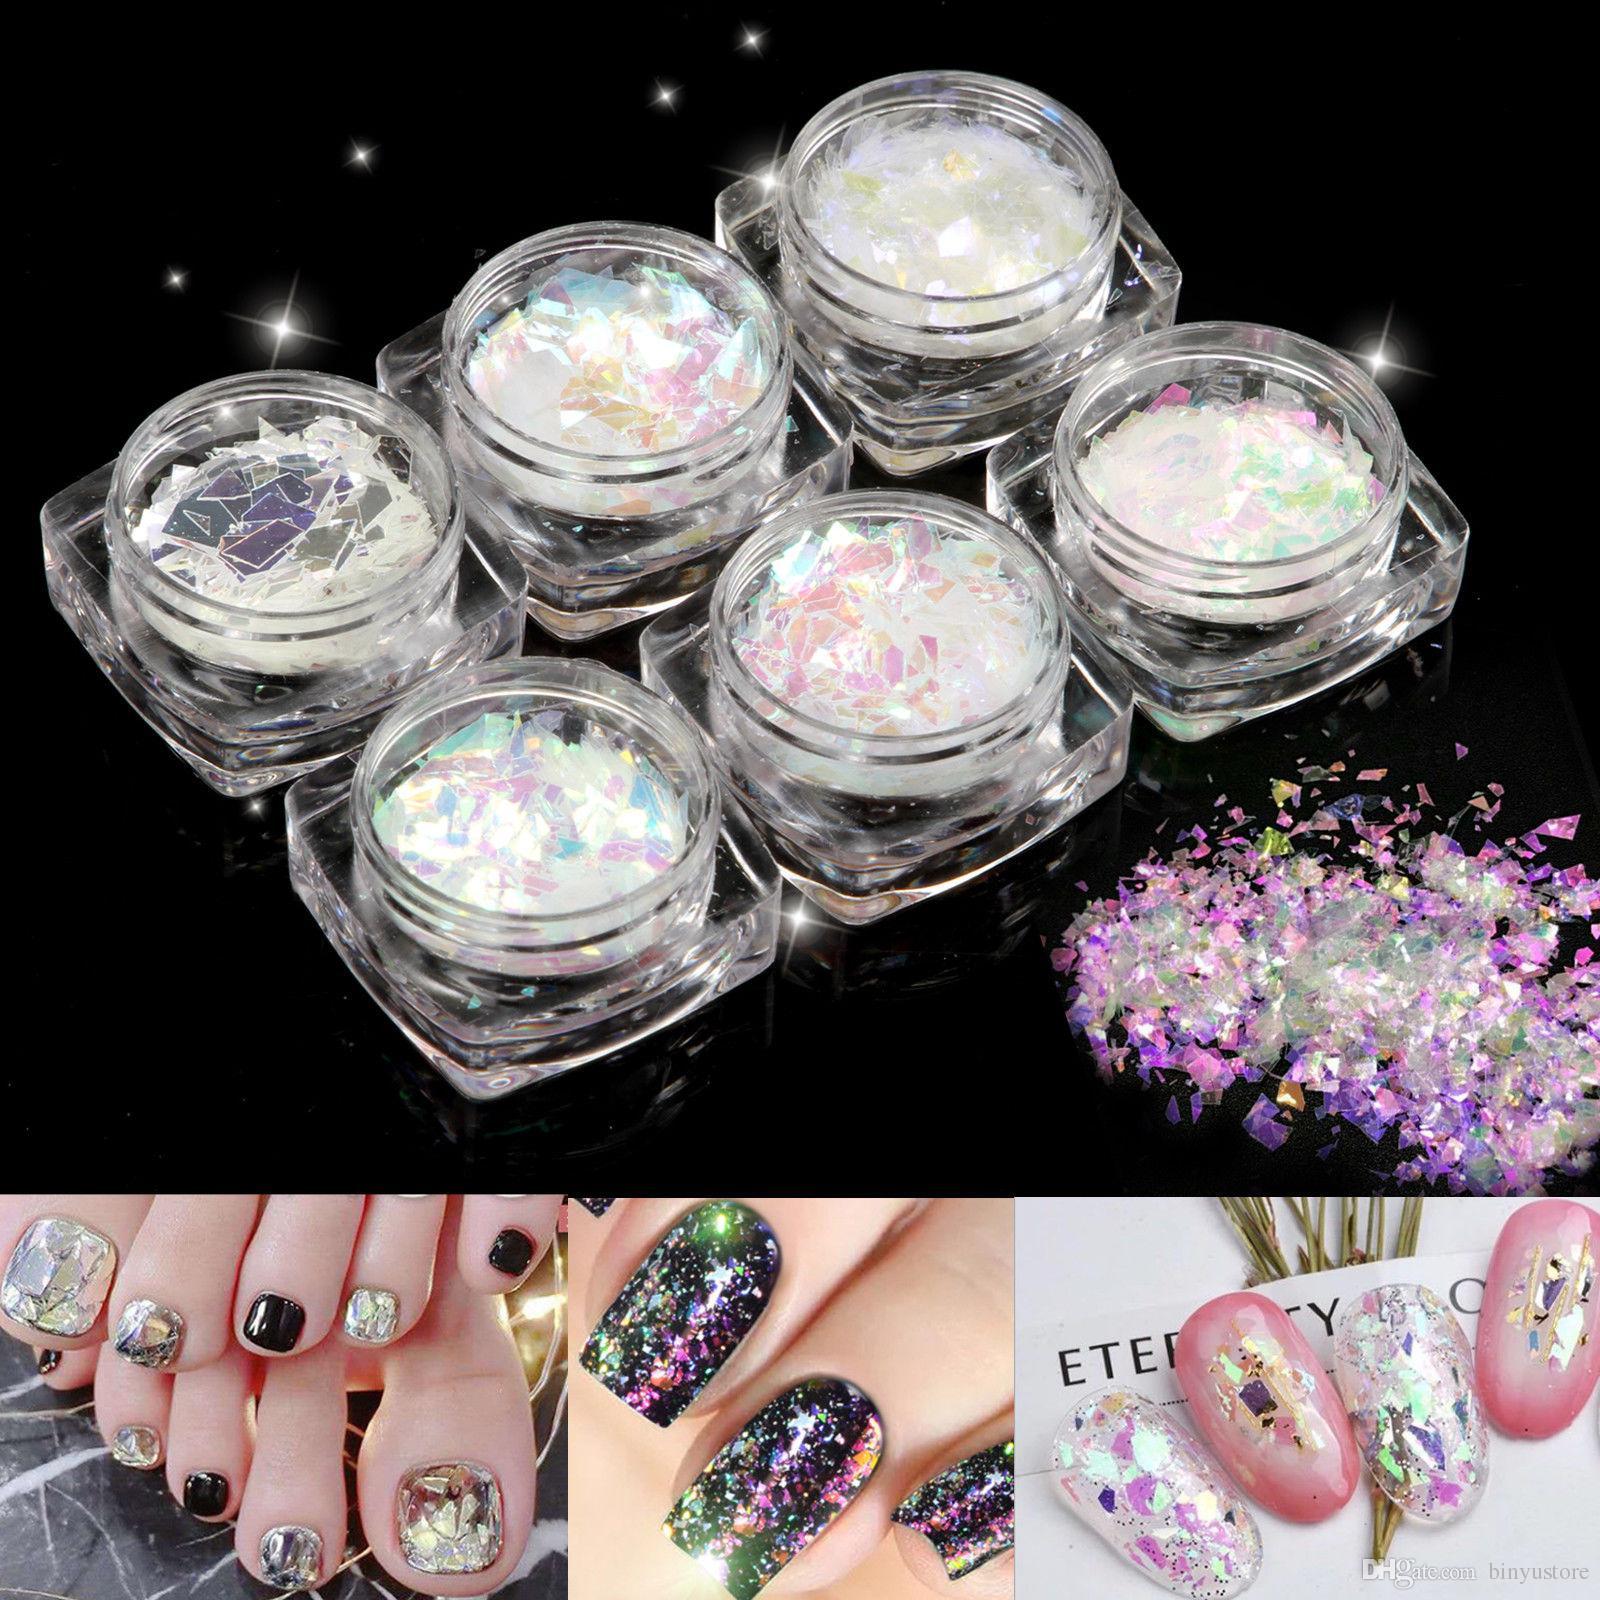 Hot sale 6 Pots Fashion Broken Glass Nail Art Tios Decoration Paillette Flake Irregular Foil Set